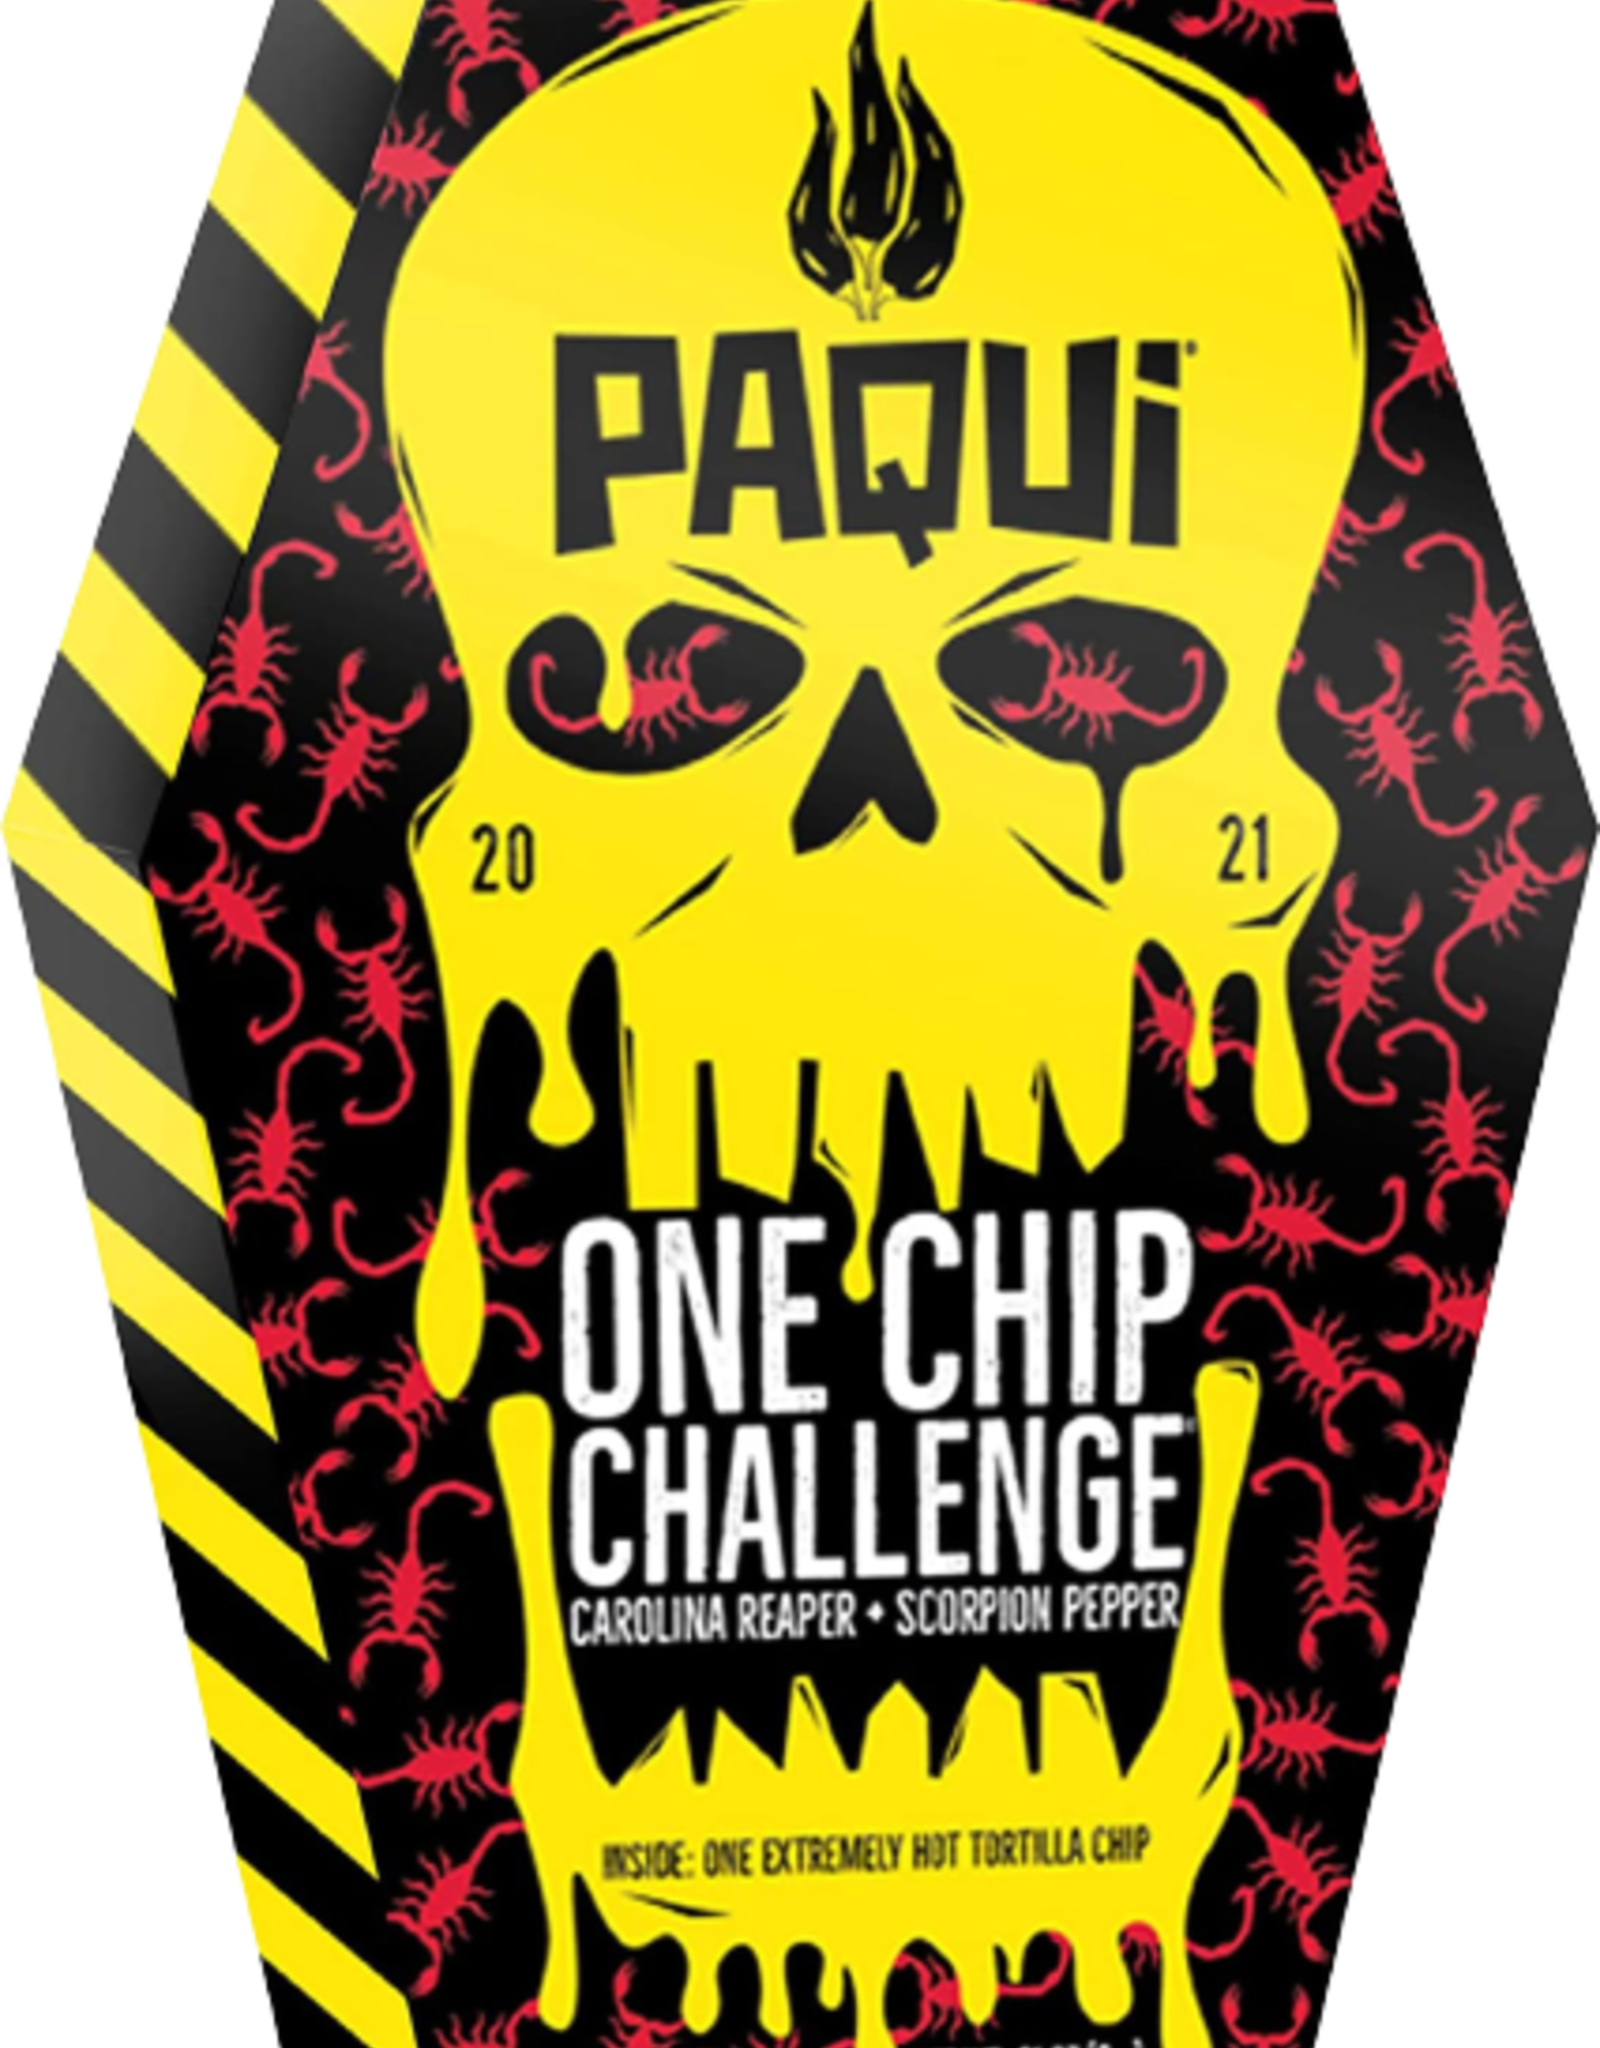 One Chip Challenge 2021